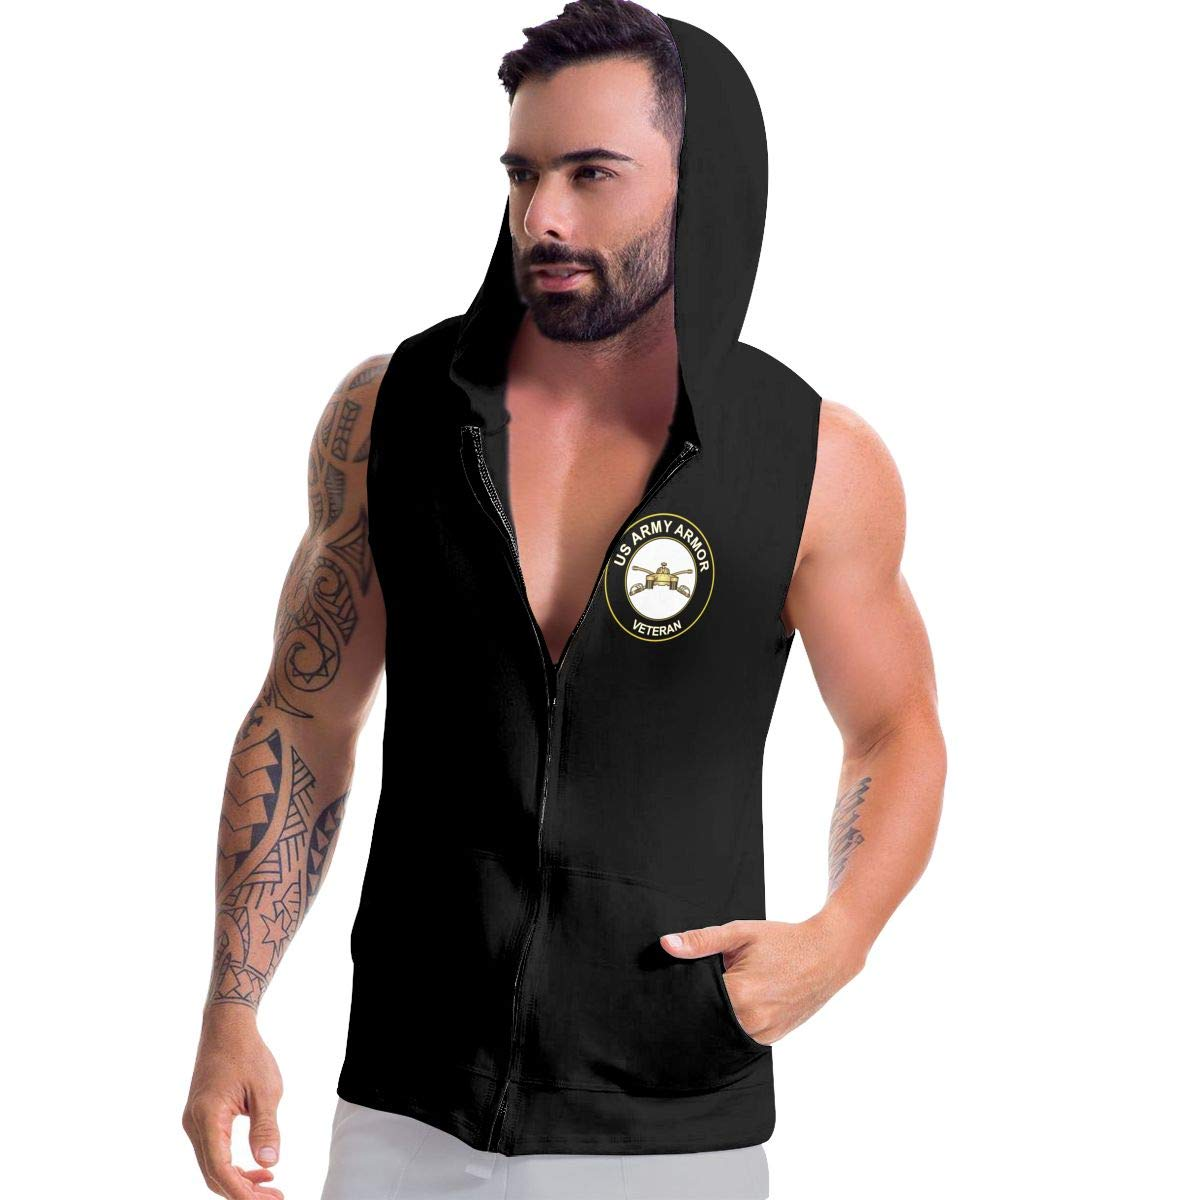 US Army Veteran Armor Mens Fashion Sleeveless Zip-up Hoodie Black with Pocket